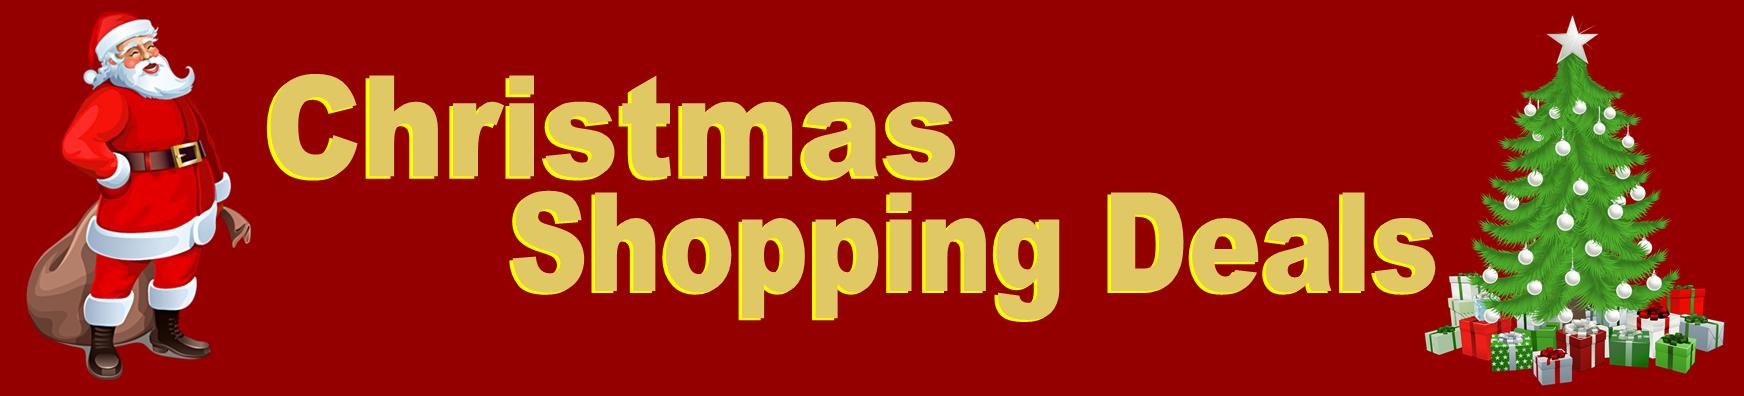 Christmas Shopping Archives - Shopping Shopping